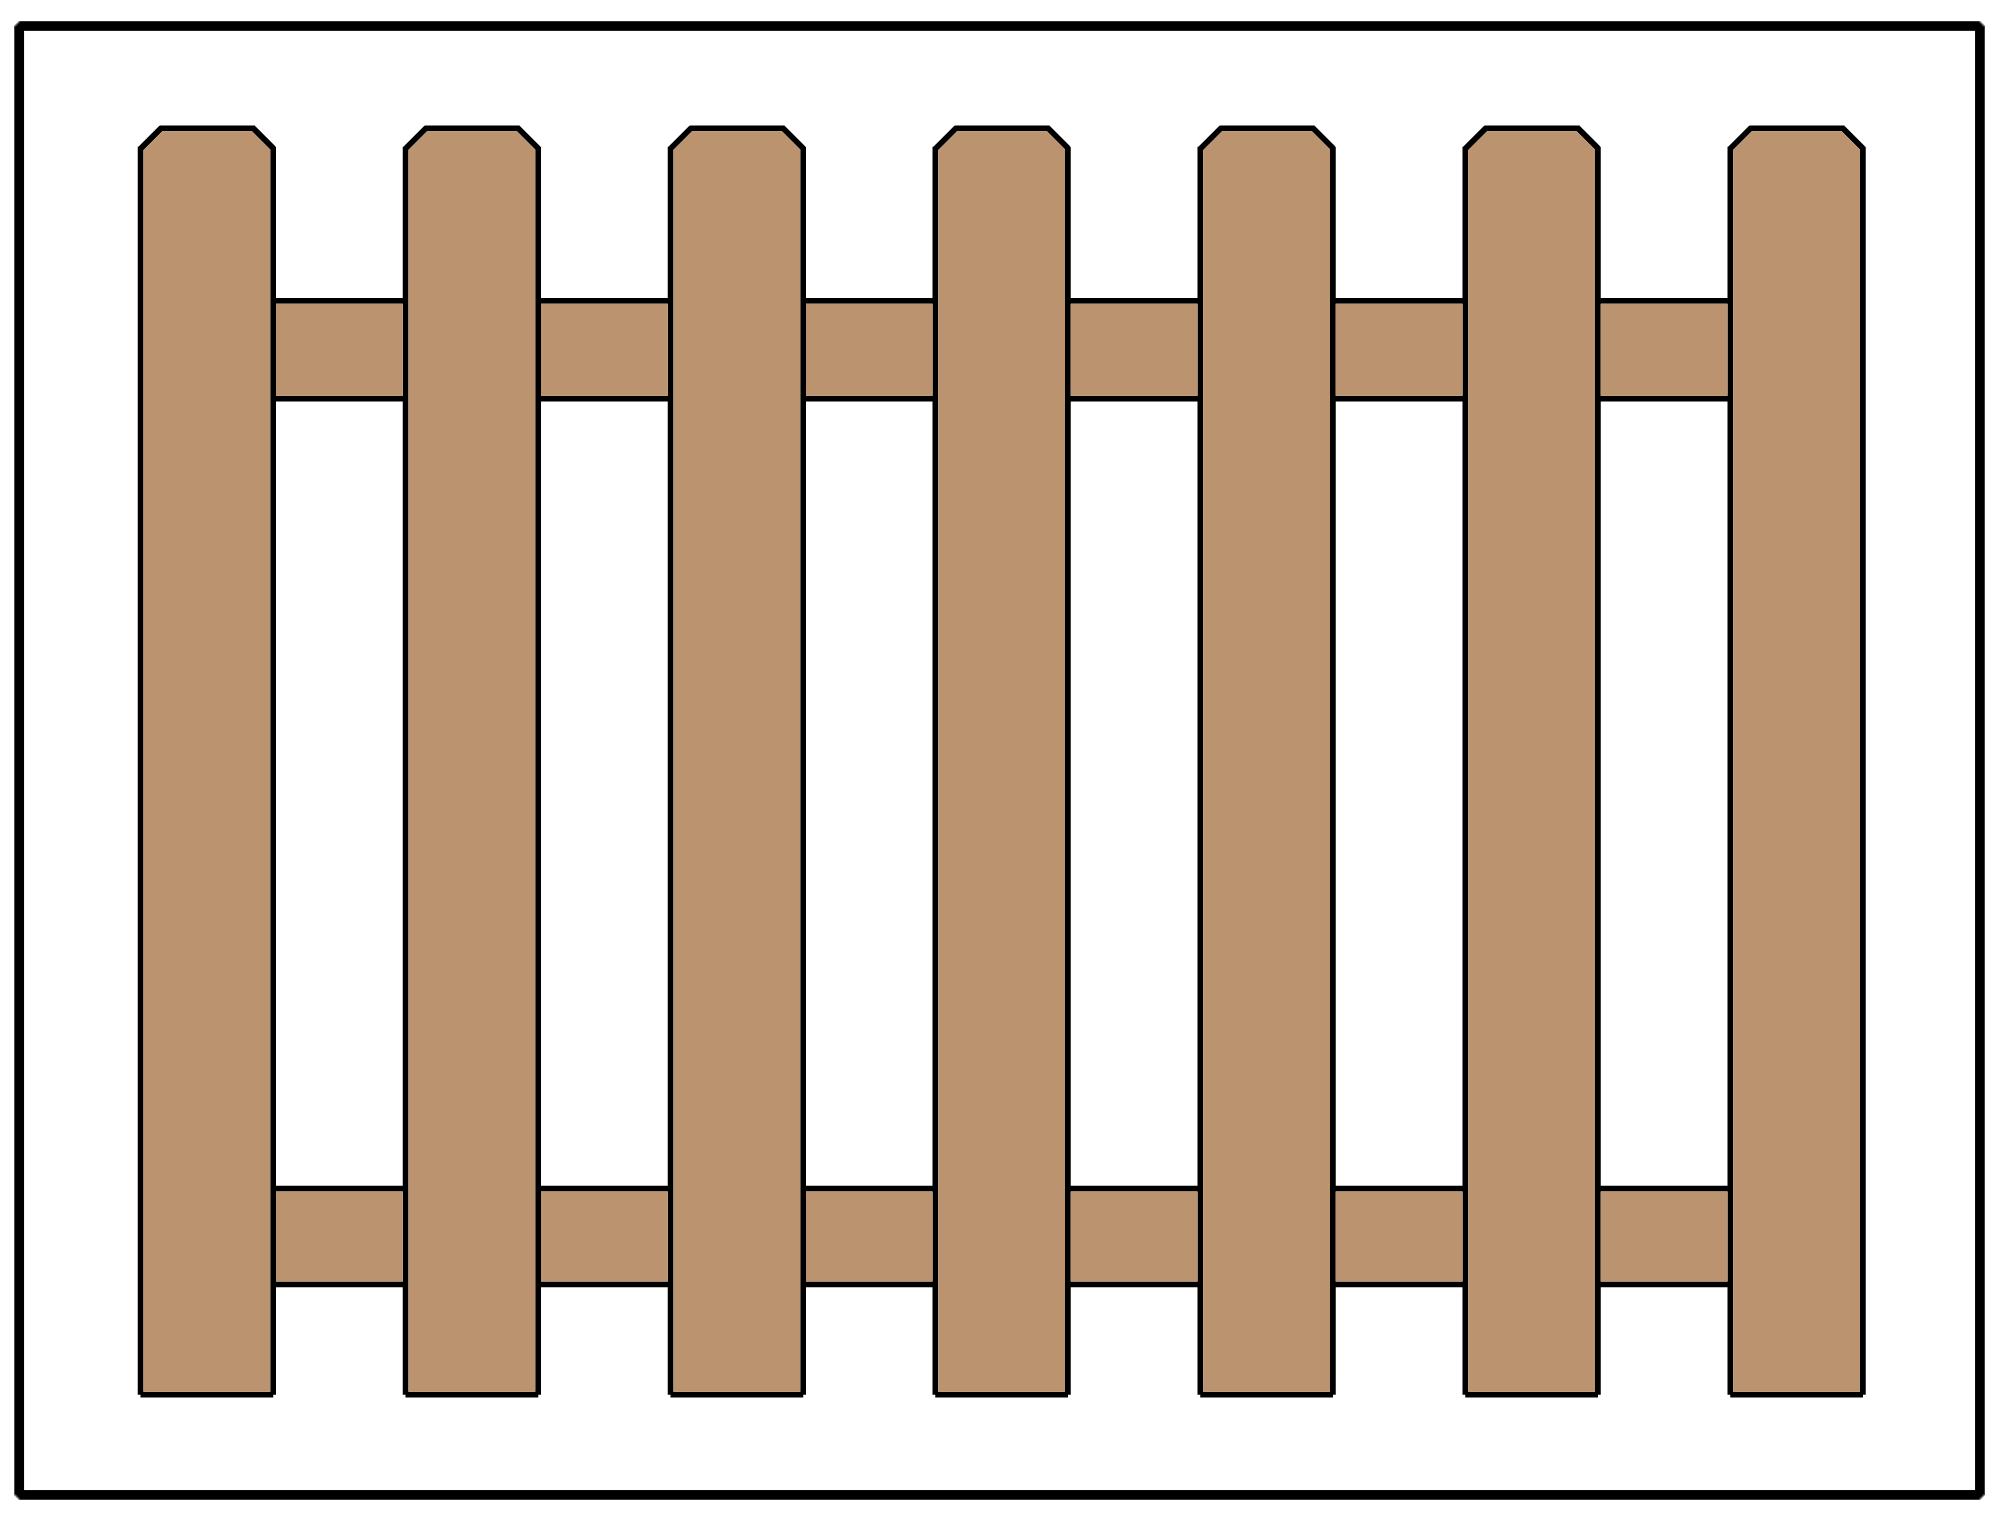 picket fence design. Picket Fence Design Using Dog Ear Pickets Picket